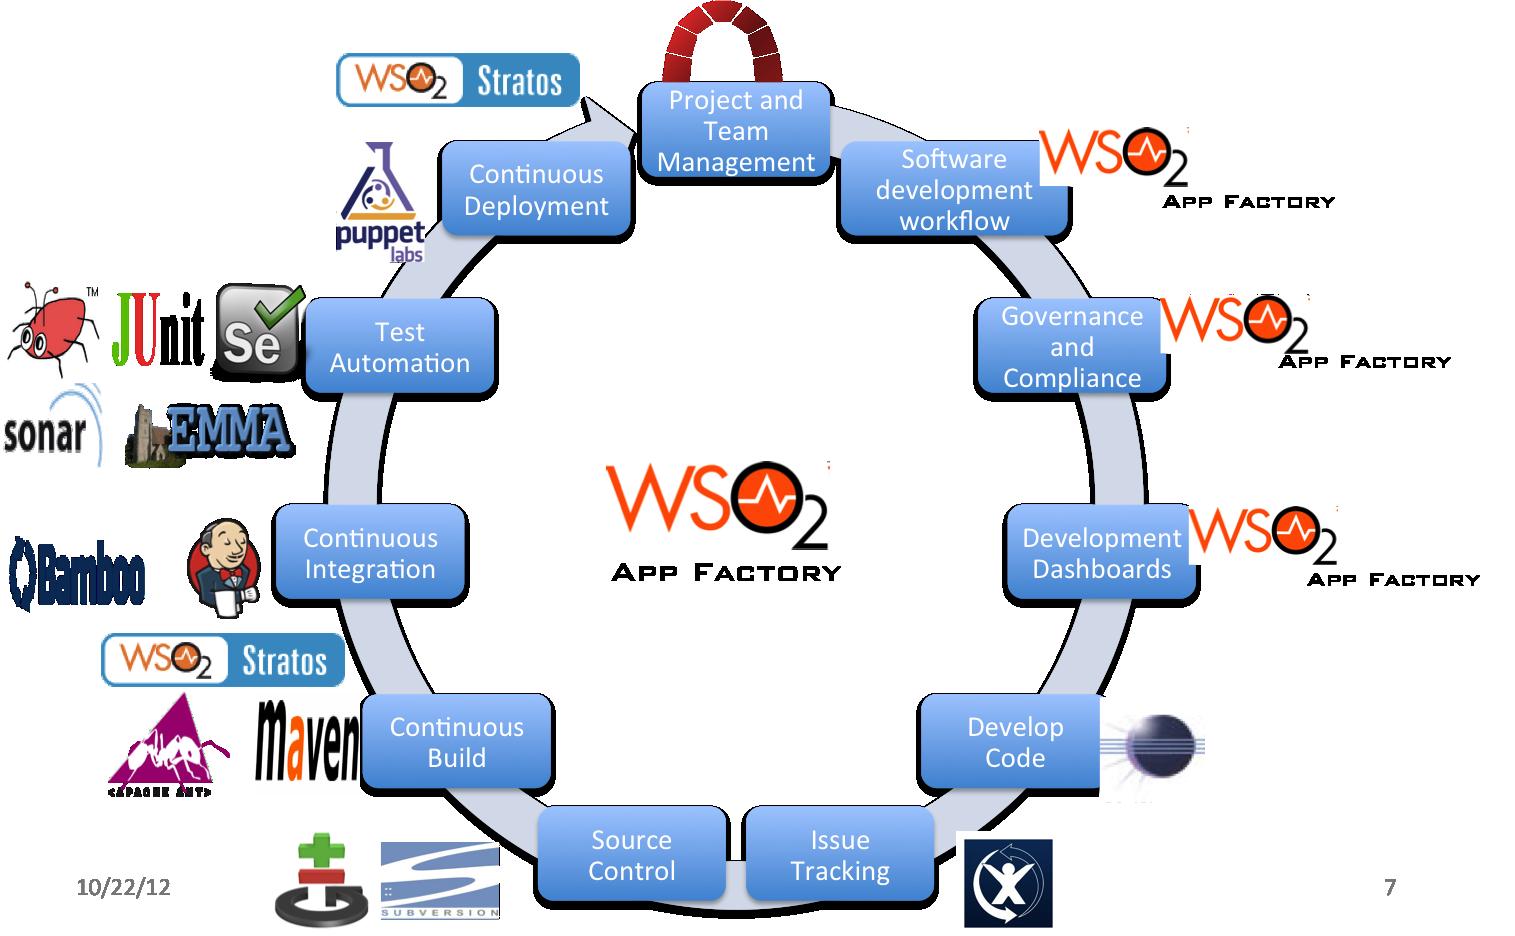 Devops factory tools for app development wso2 app factory for Application design tools